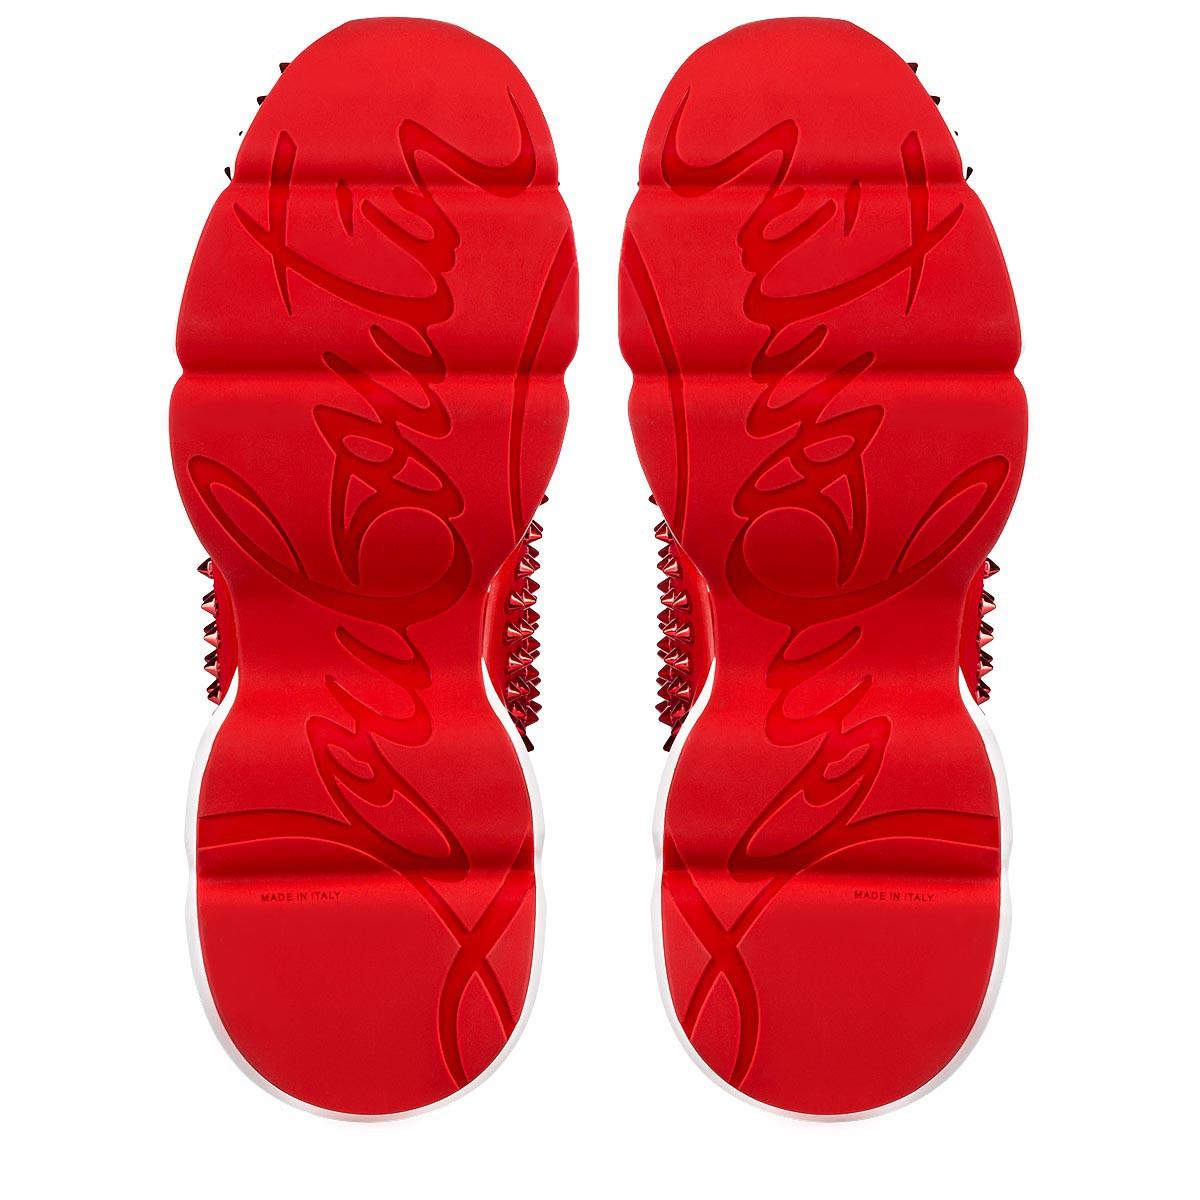 Shoes - Spike-sock - Christian Louboutin